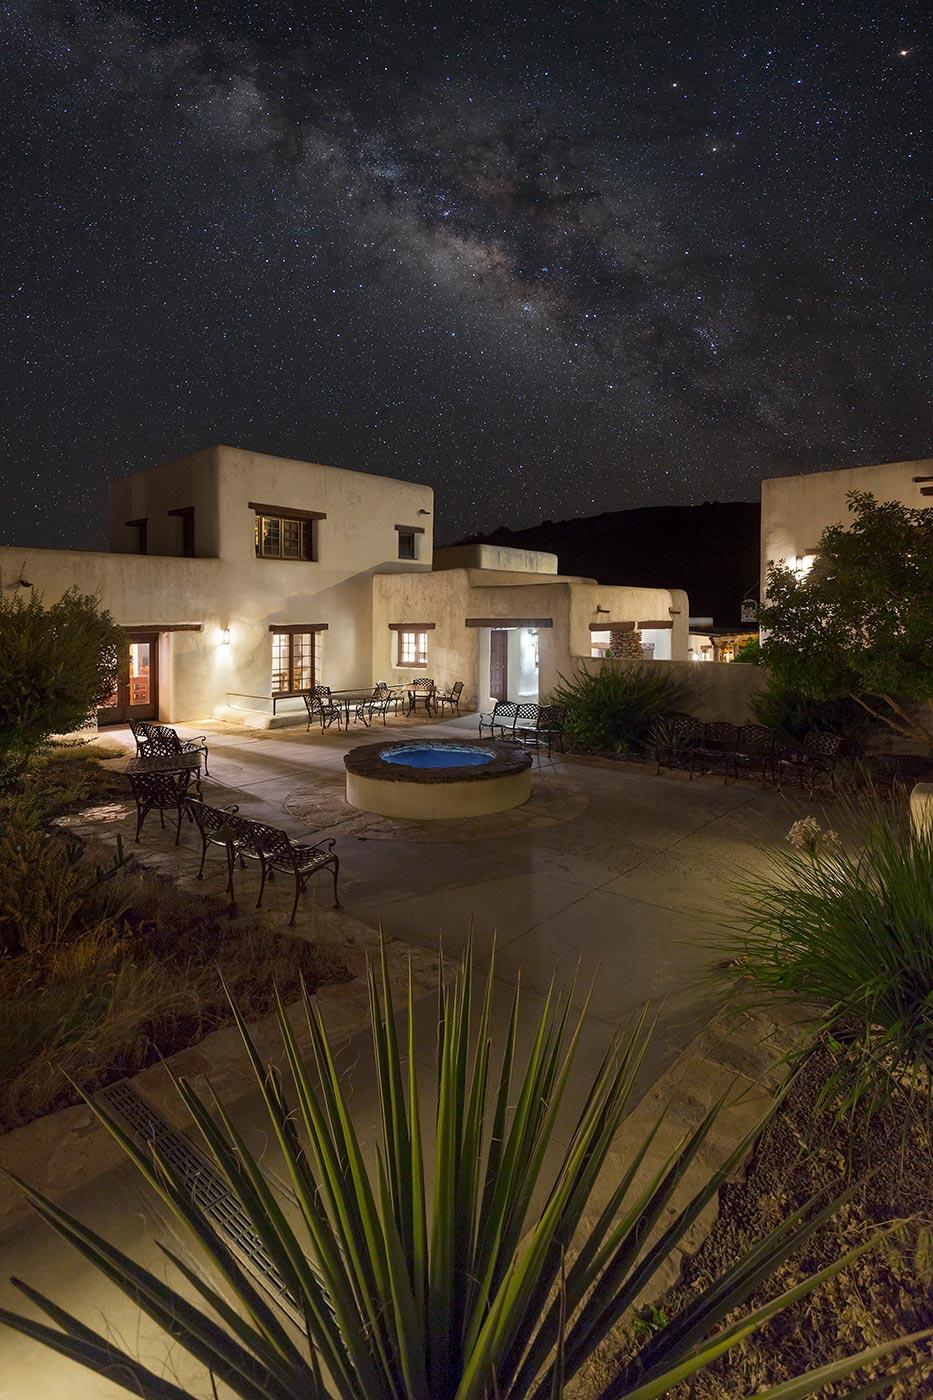 Travel-ABP-Indian-Lodge-Milky-Way.jpg